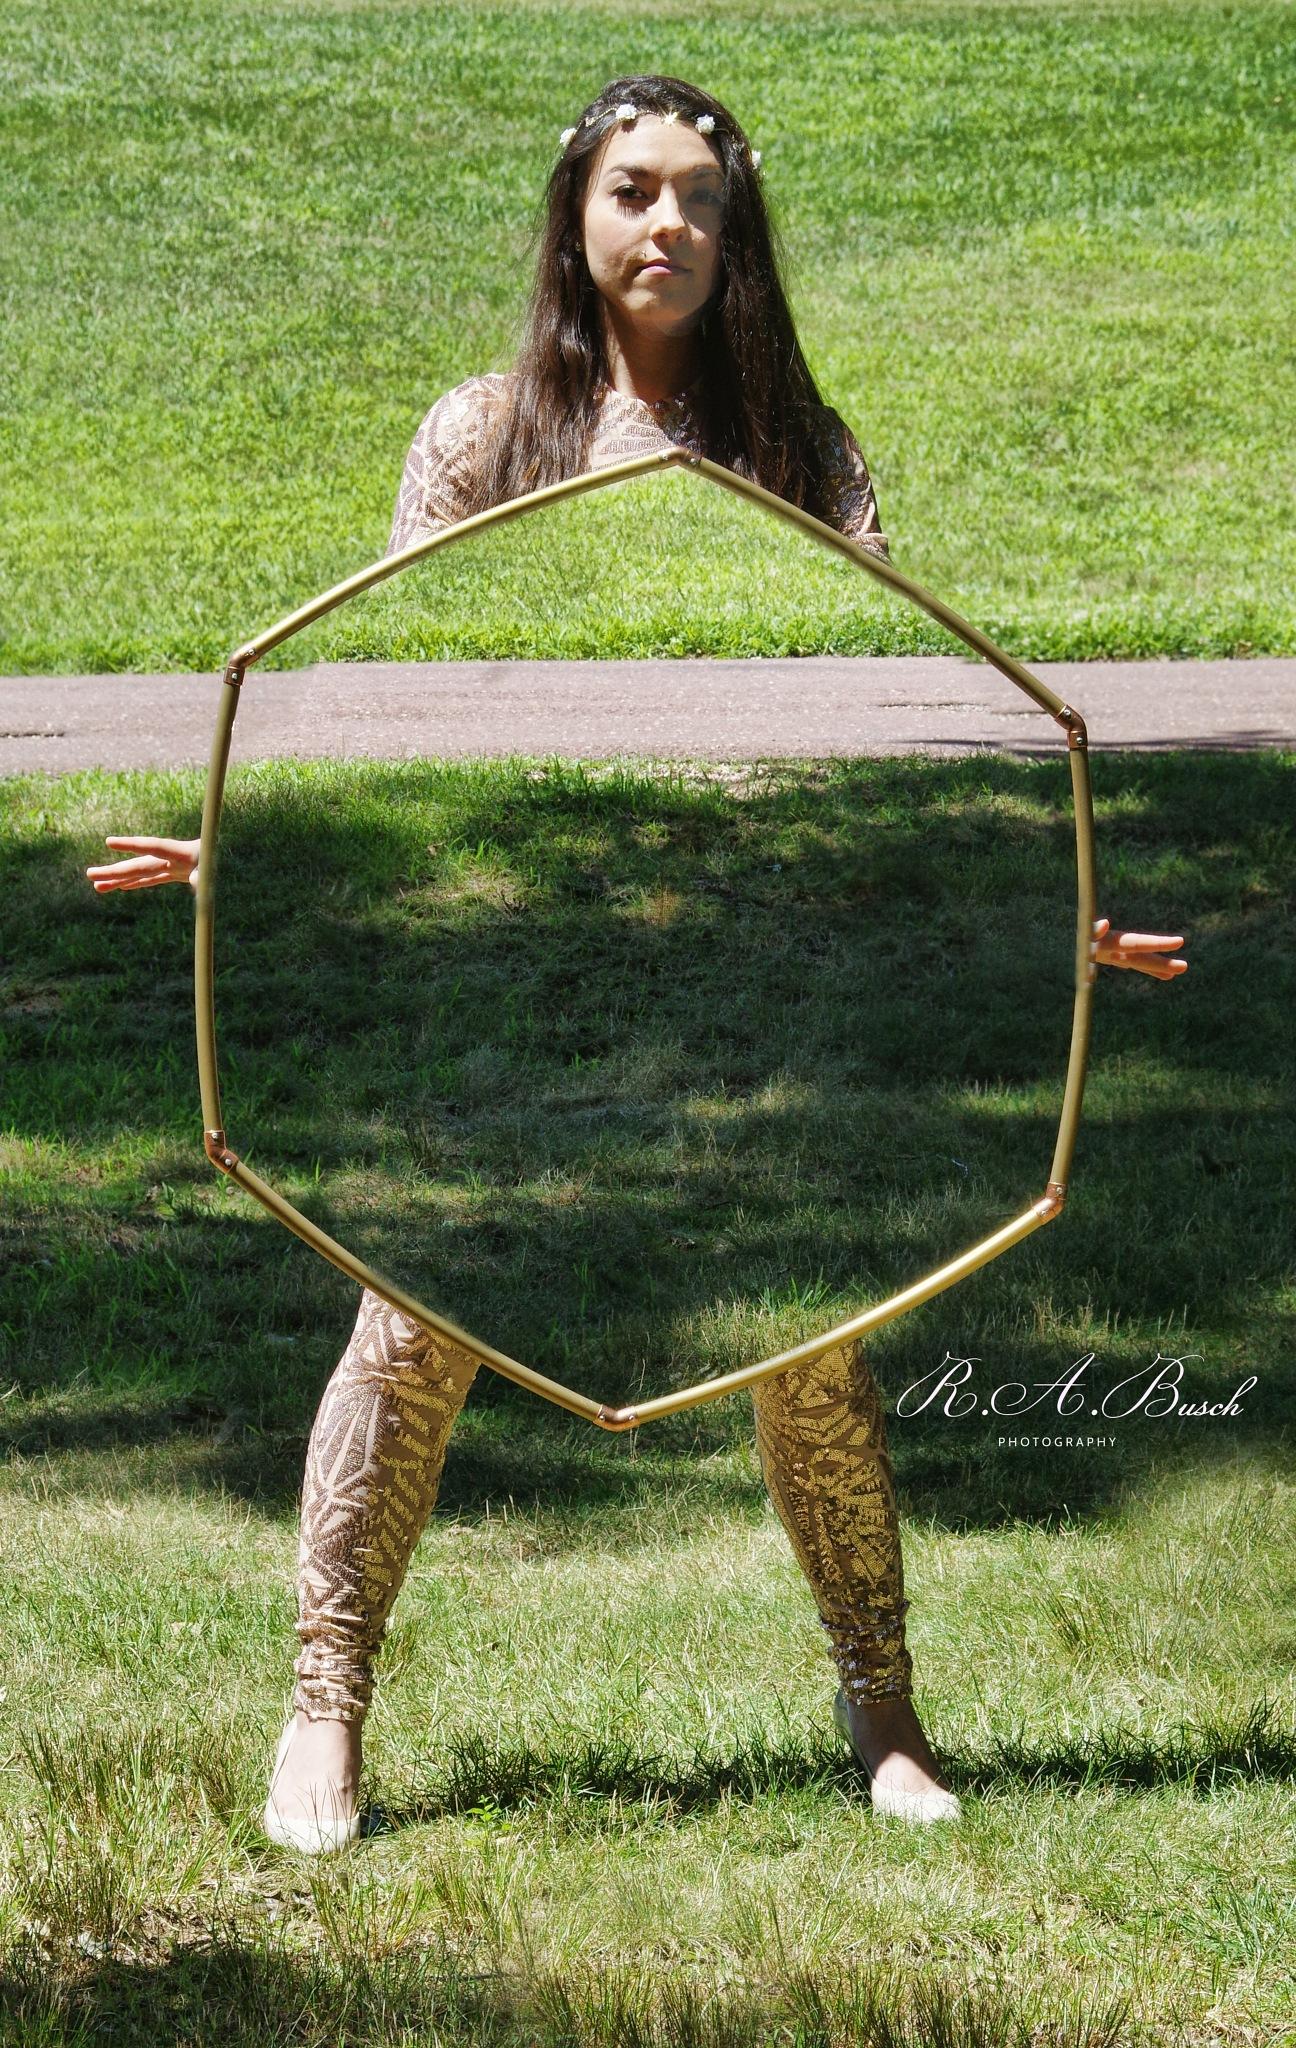 Magic hoop  by RichardABusch